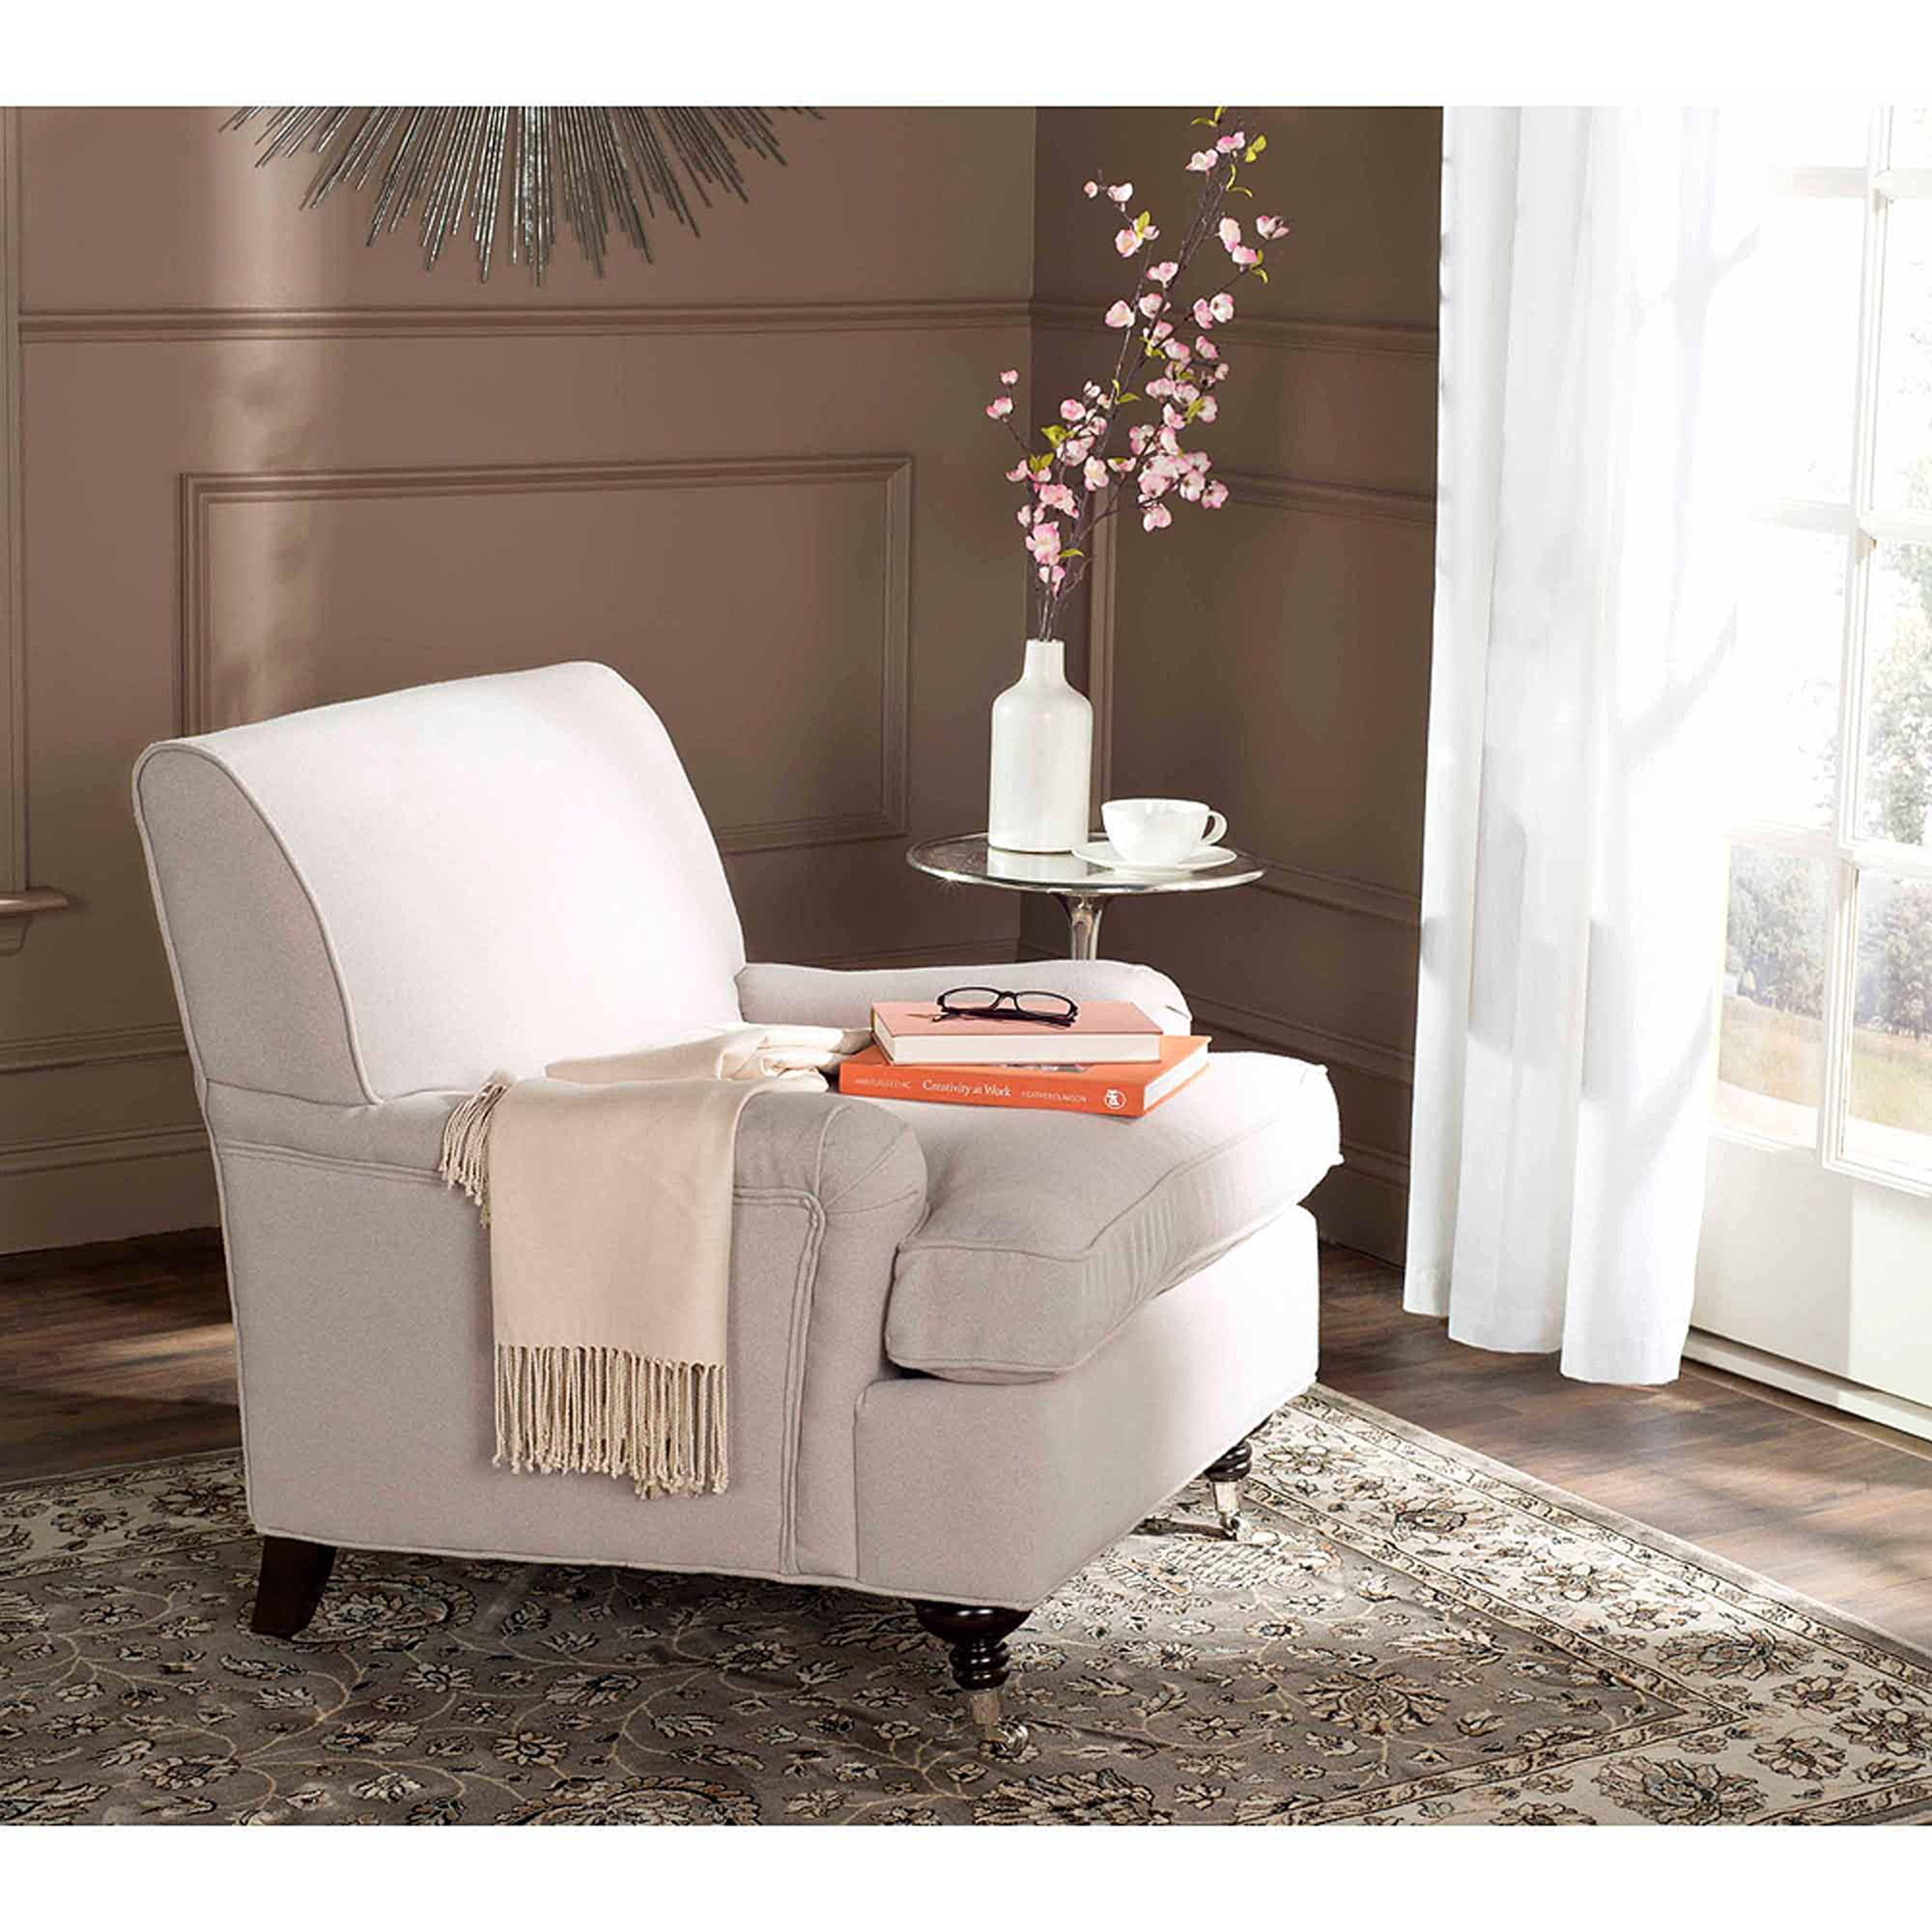 Safavieh Chloe Upholstered Club Chair by Safavieh